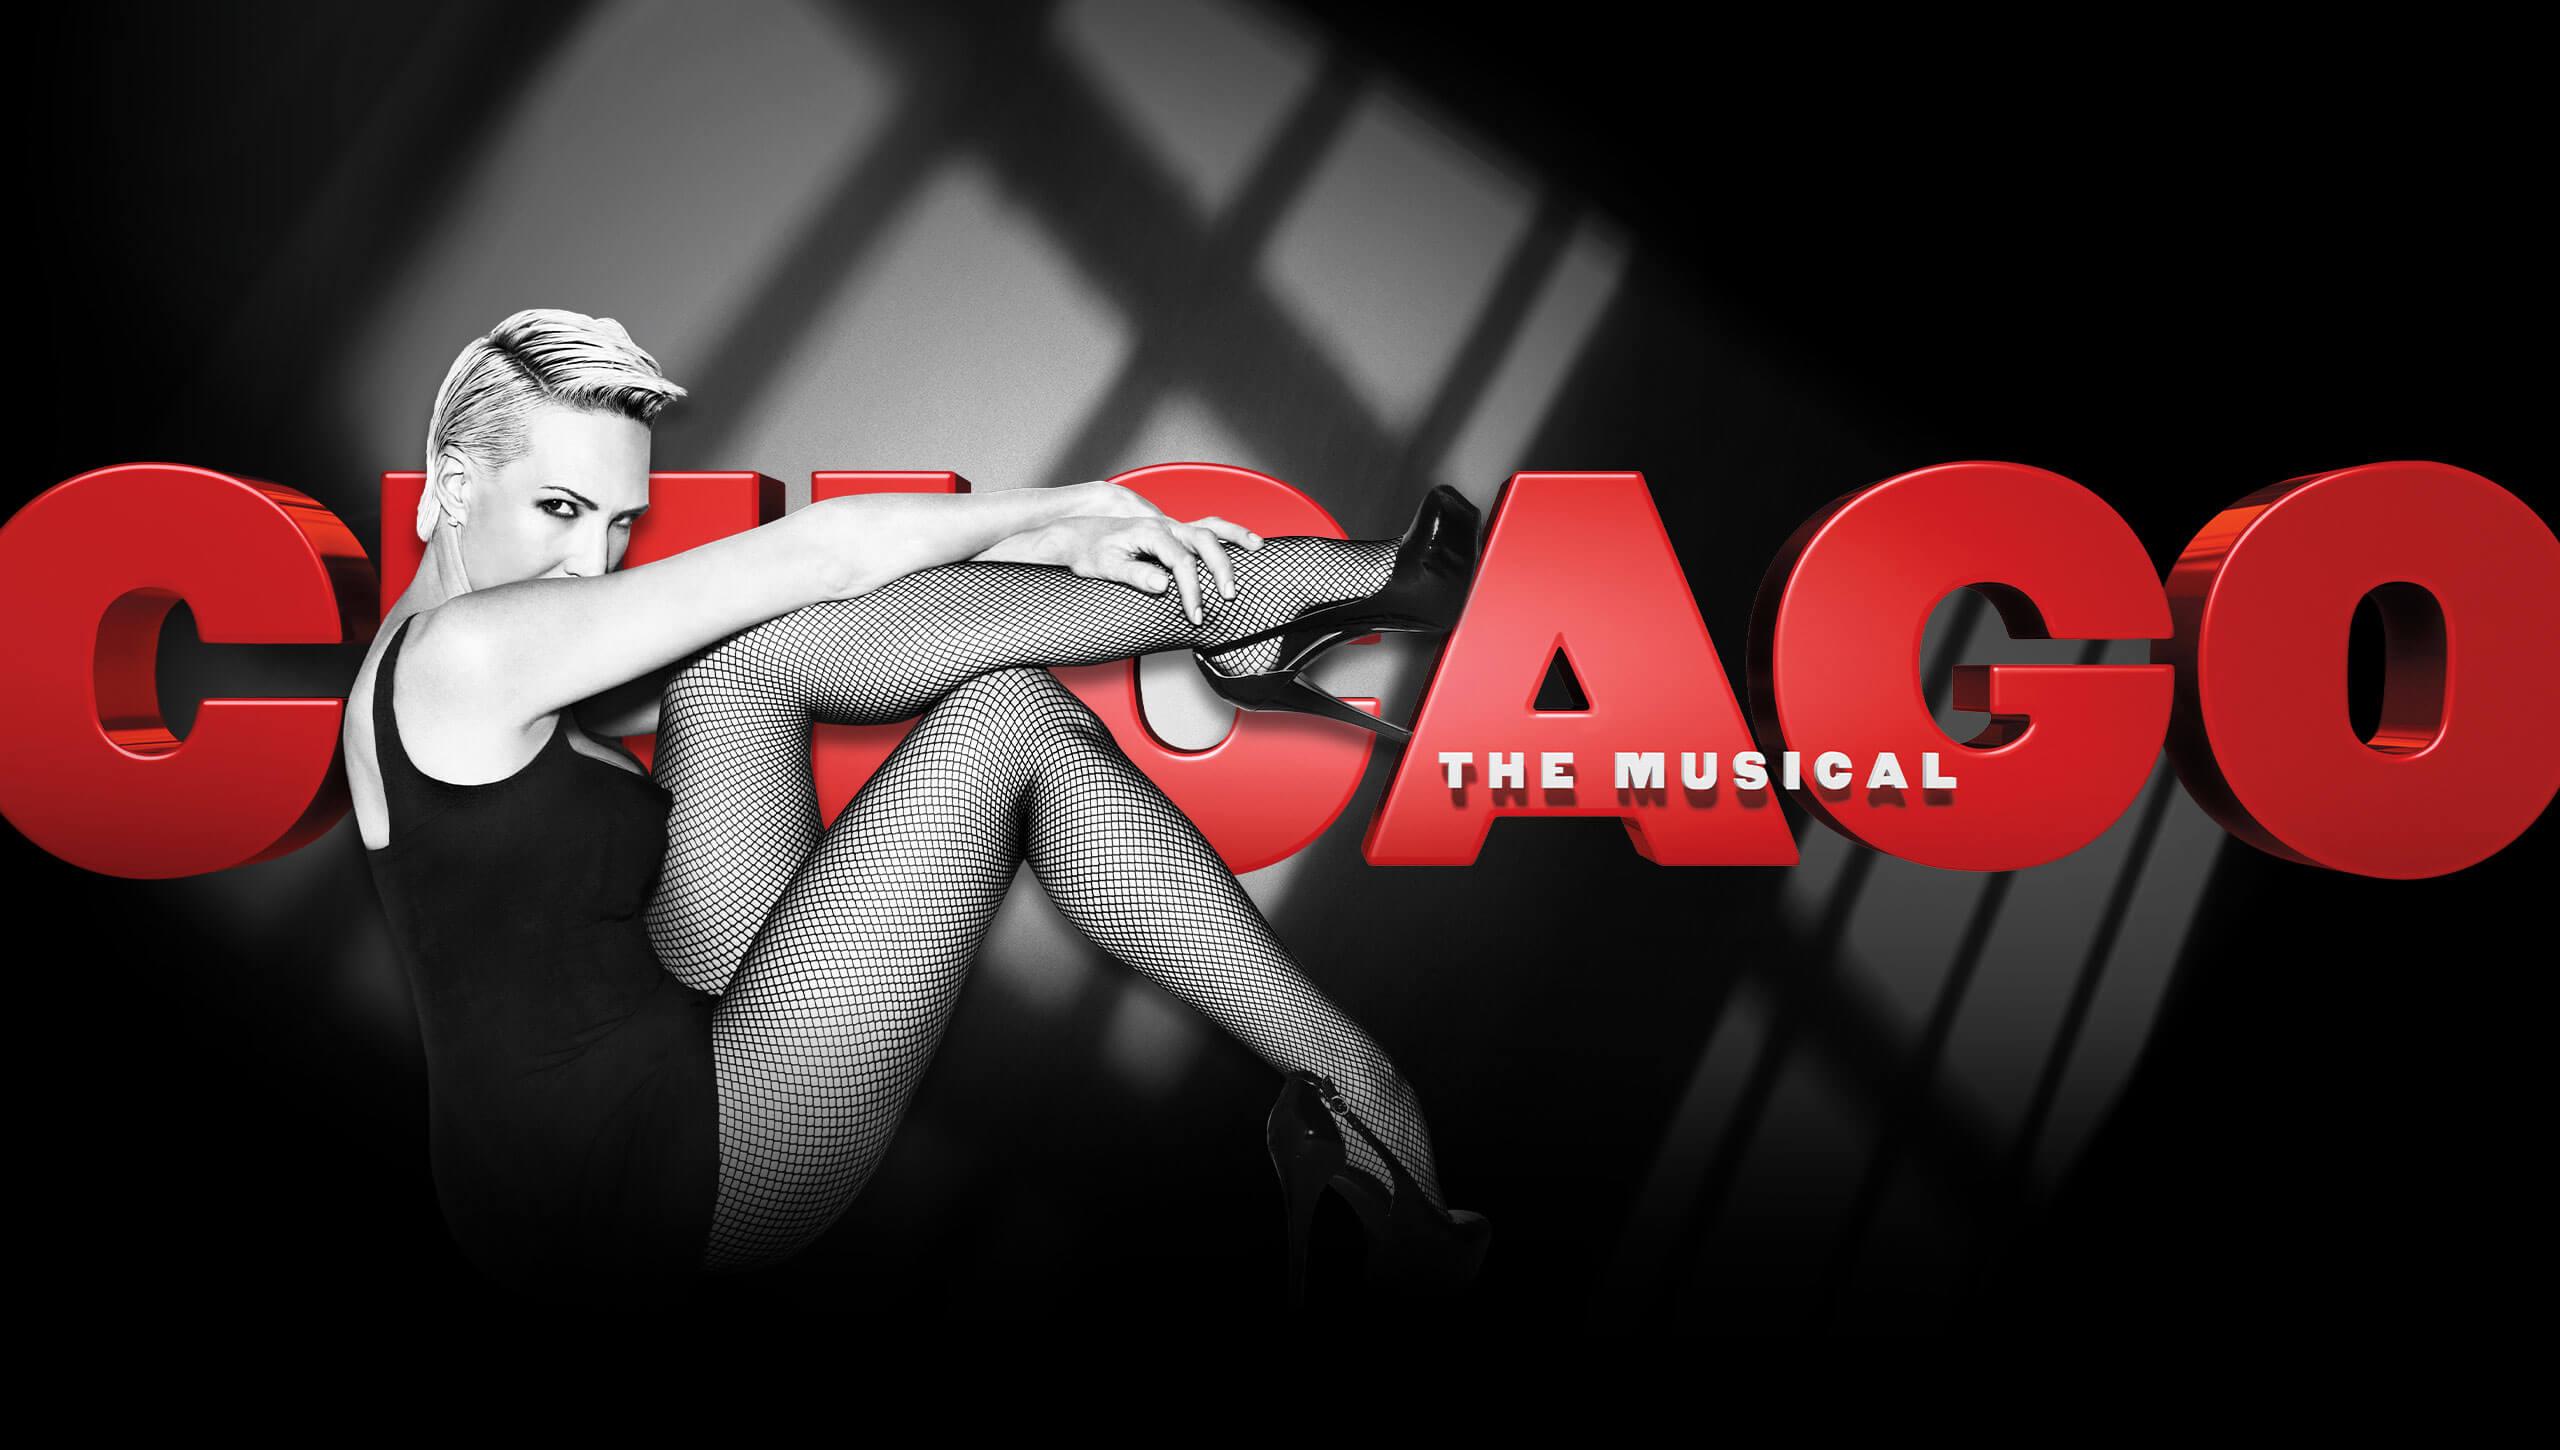 Broadway Cast & Creative header image